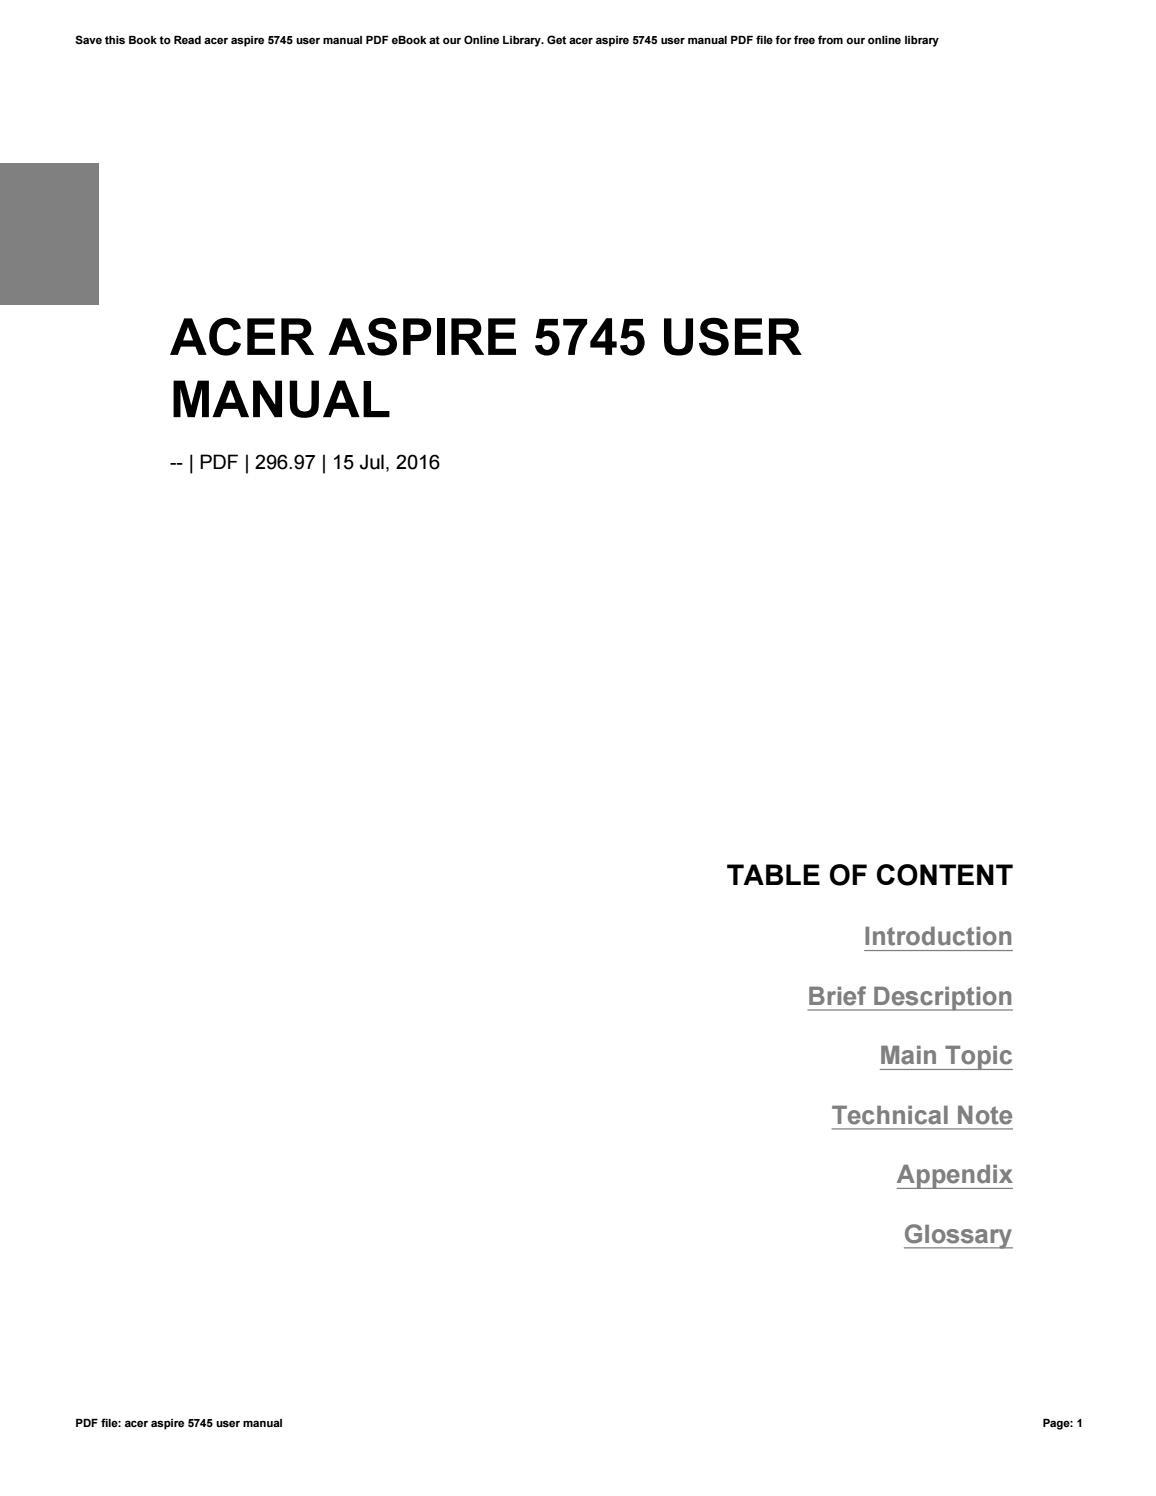 Acer Aspire 5040 User Manual